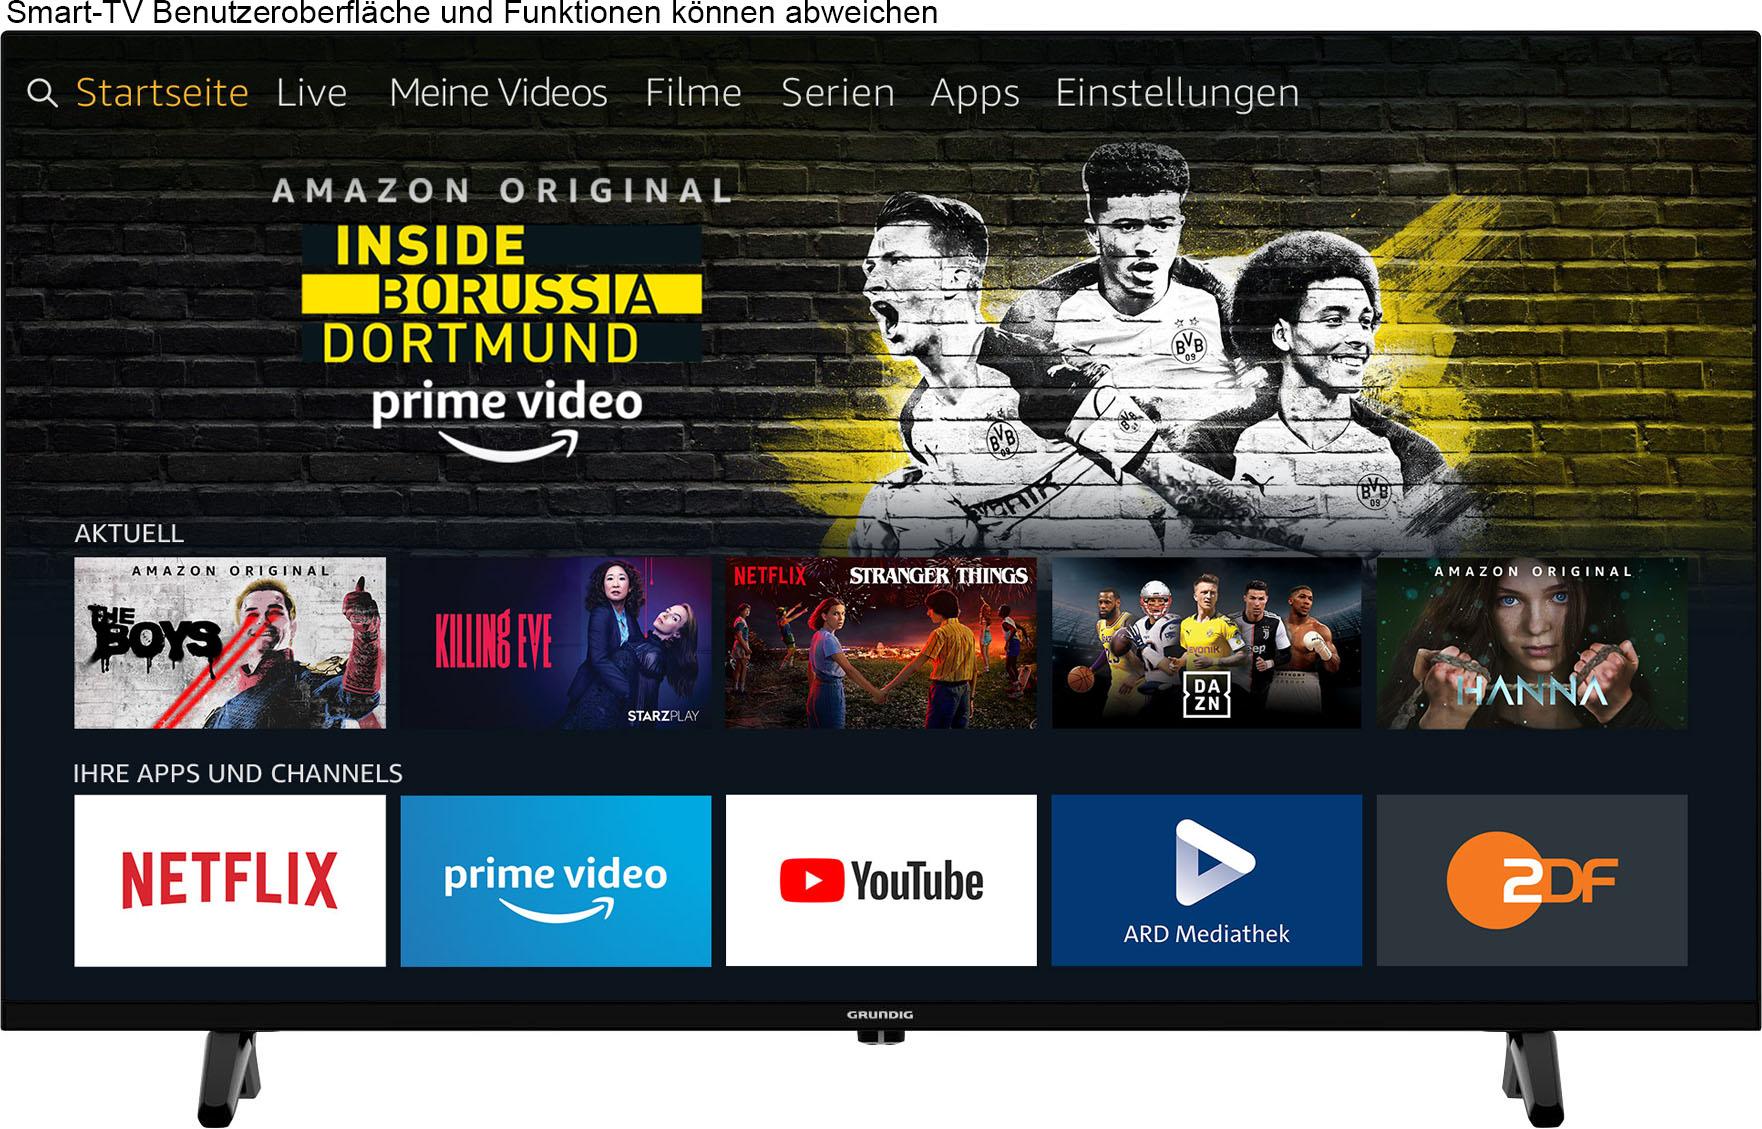 Grundig LED-Fernseher 40 VOE 61 Fire TV Edition TTE000 , 100 cm 40 , Full HD, Smart-TV, Fire-TV Edition